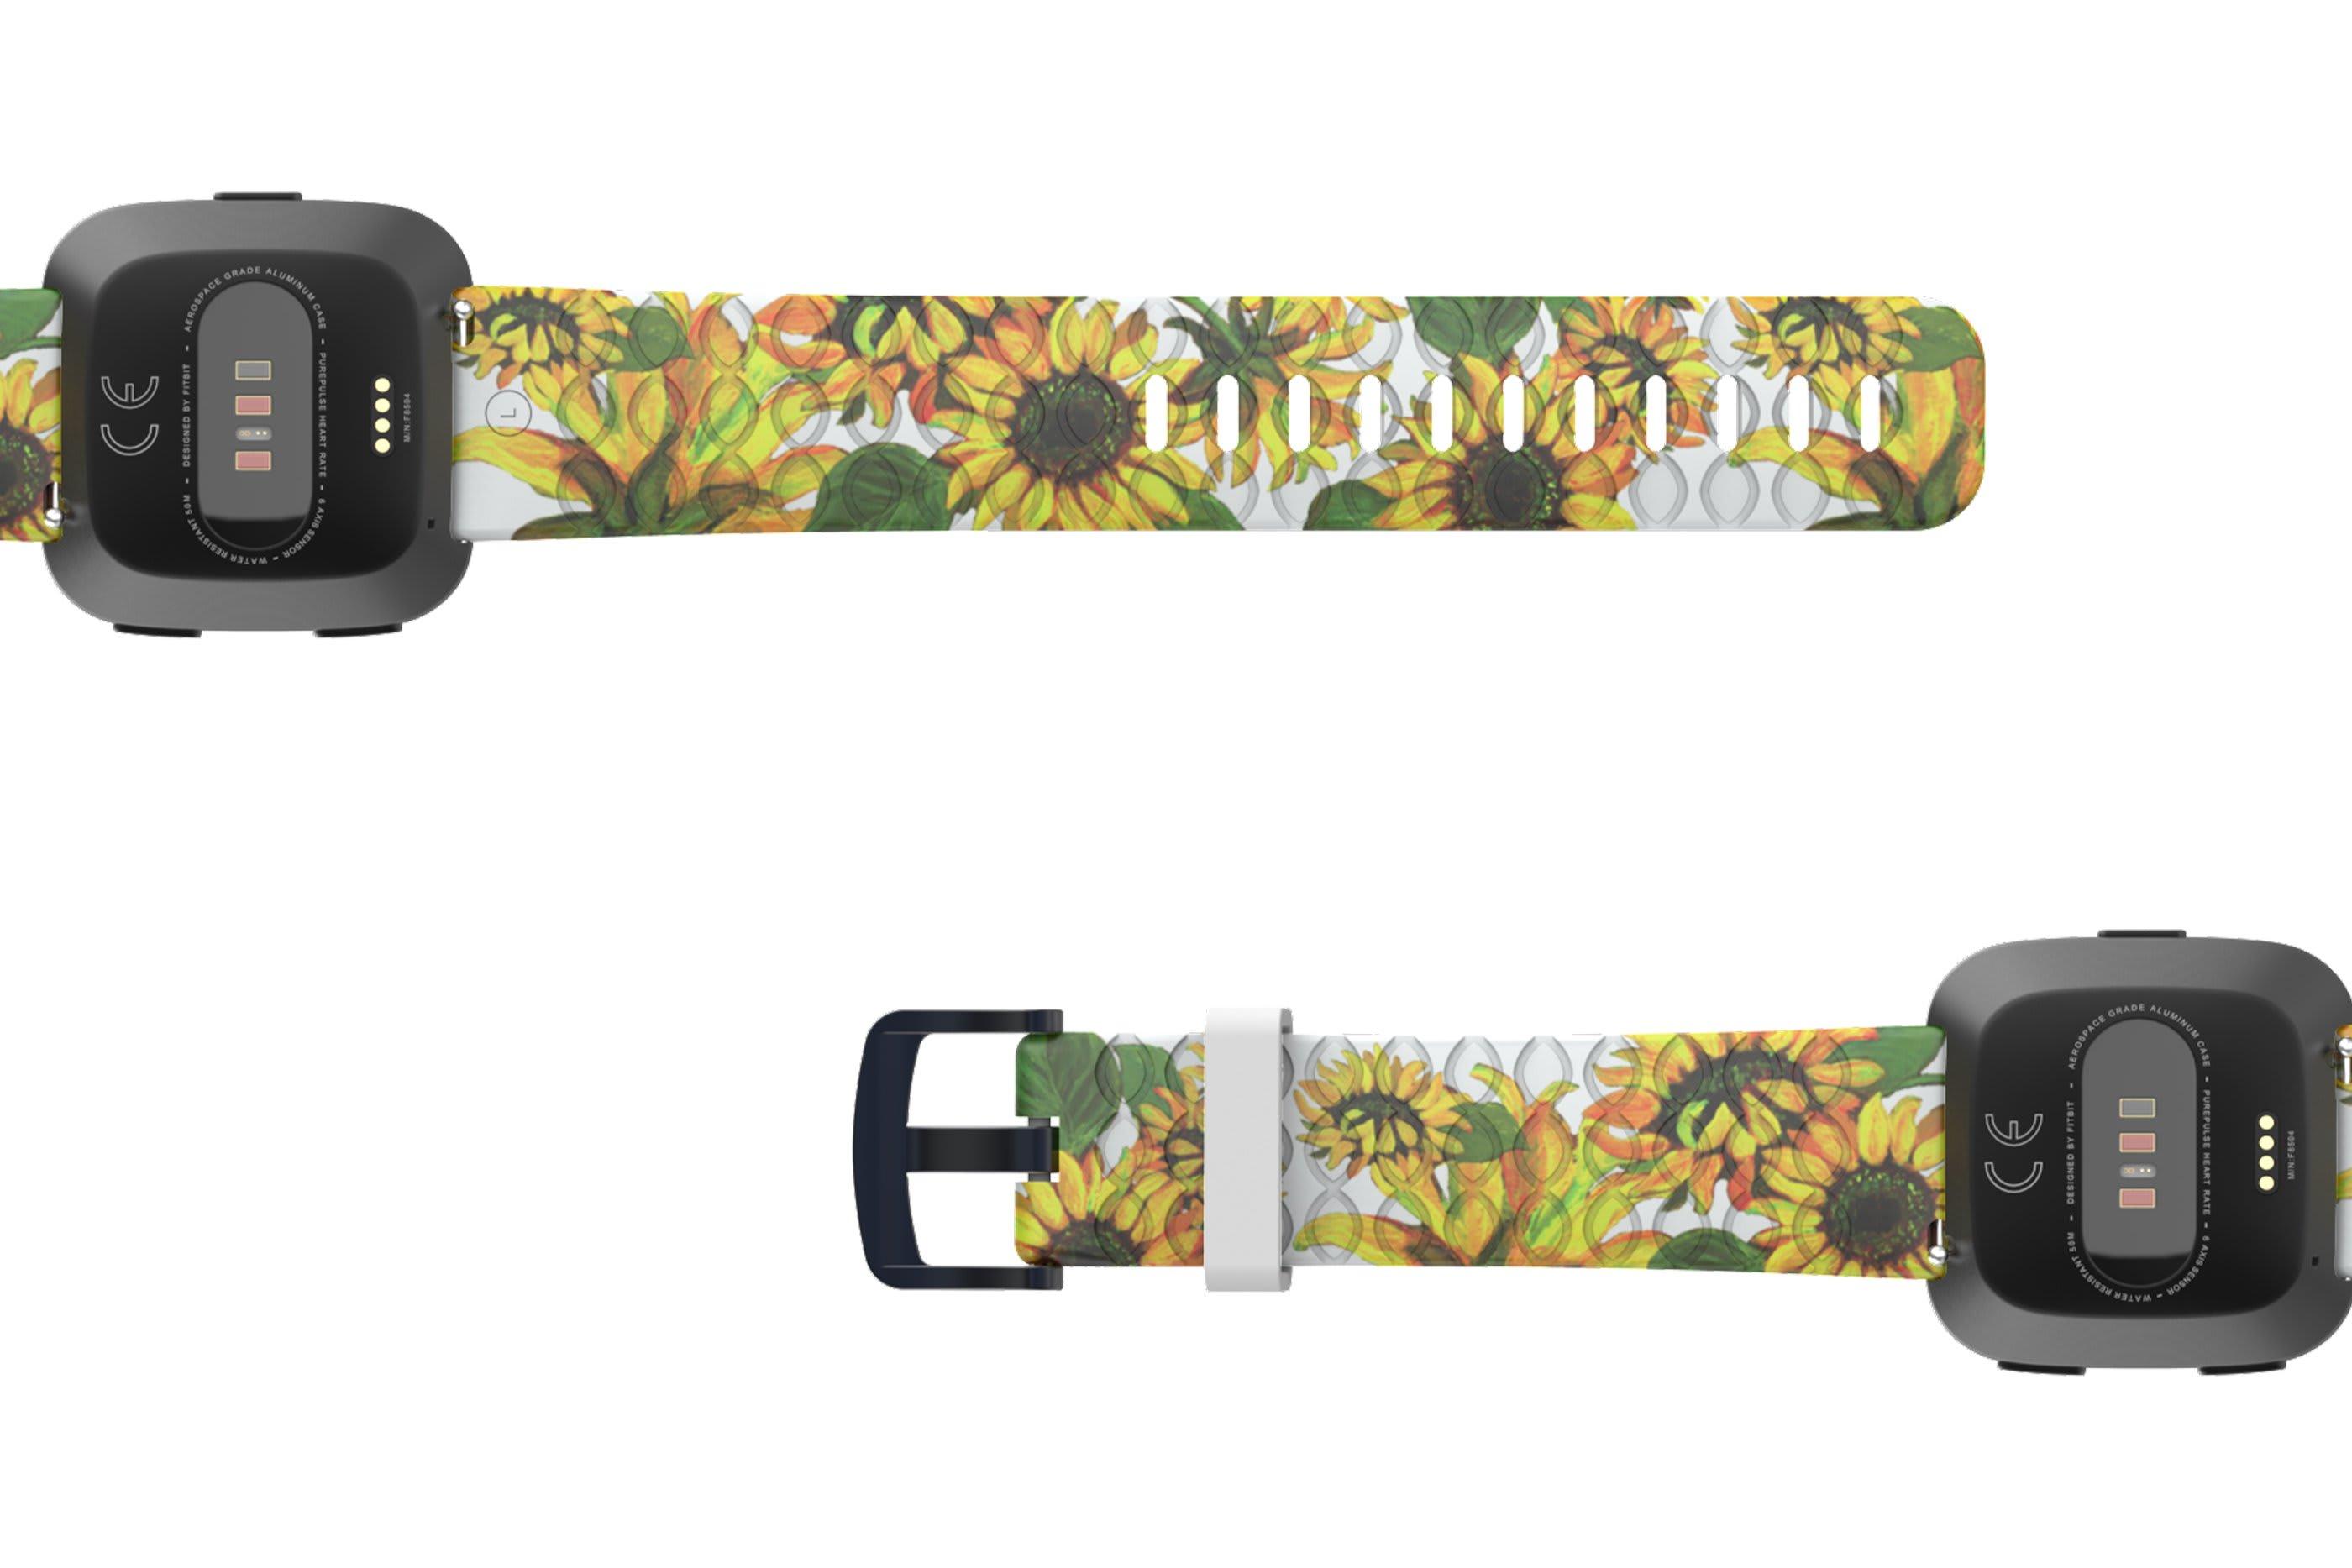 Sunflower Fitbit Versa   watch band  with gray hardware viewed bottom up